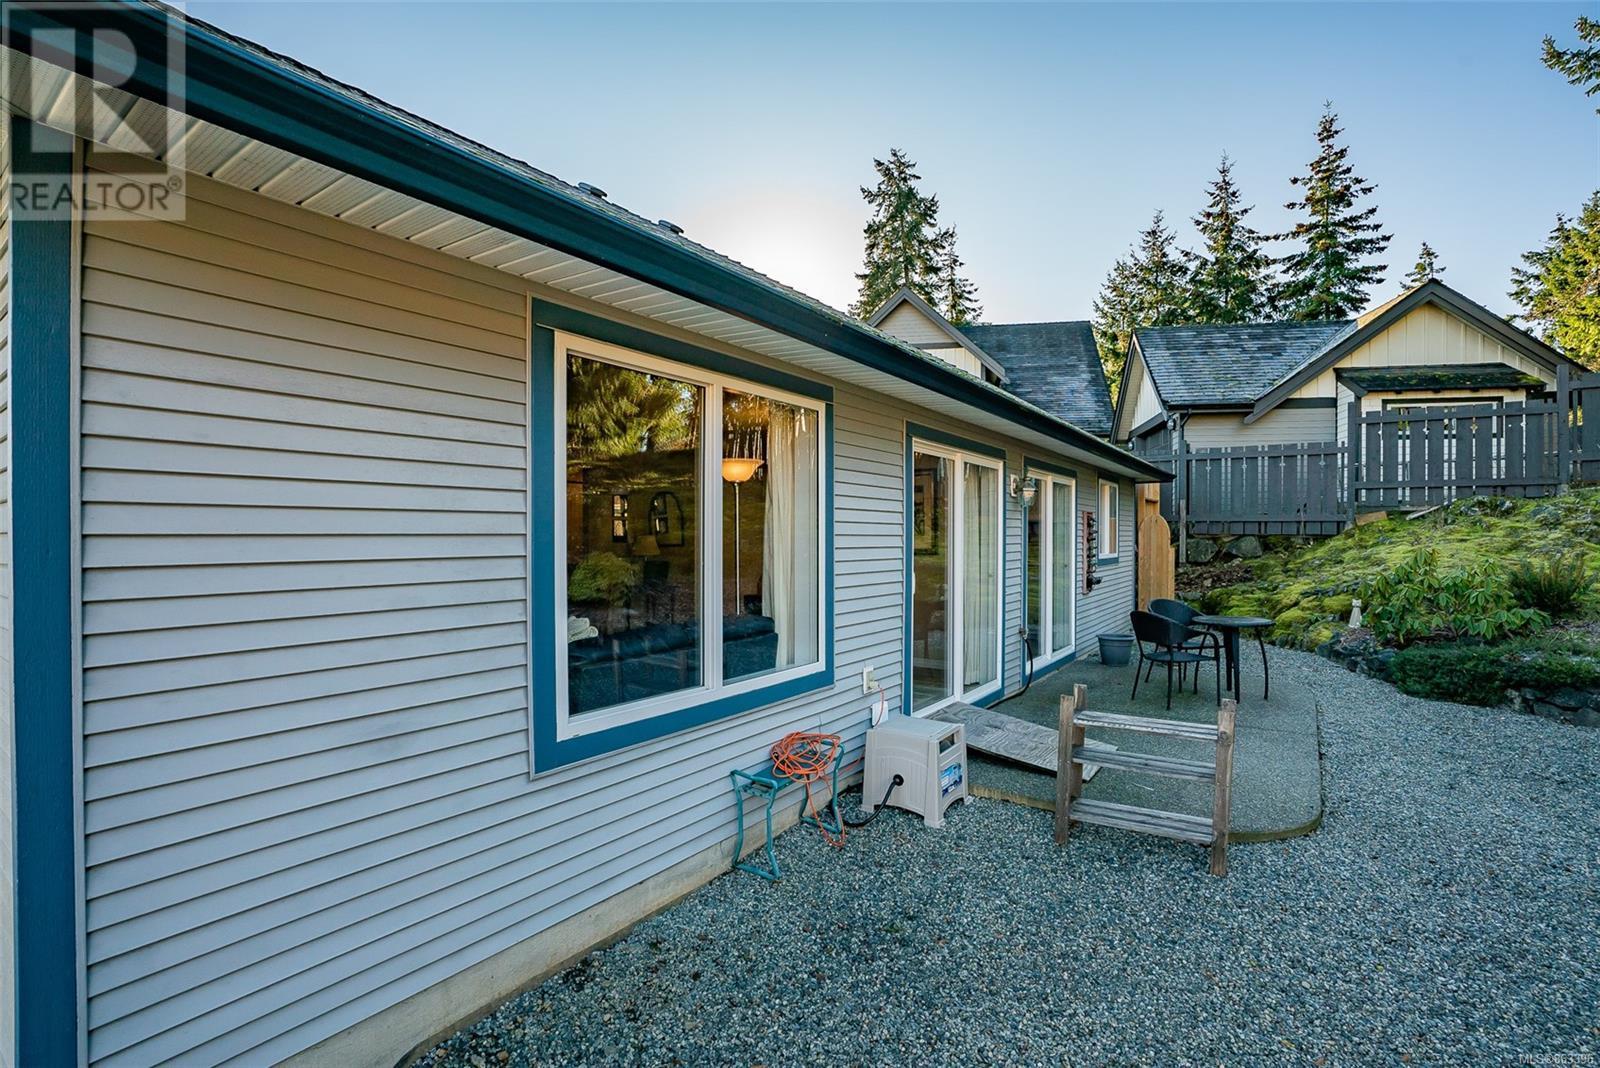 3343 Wavecrest Dr, Nanaimo, British Columbia  V9T 5X1 - Photo 22 - 863396